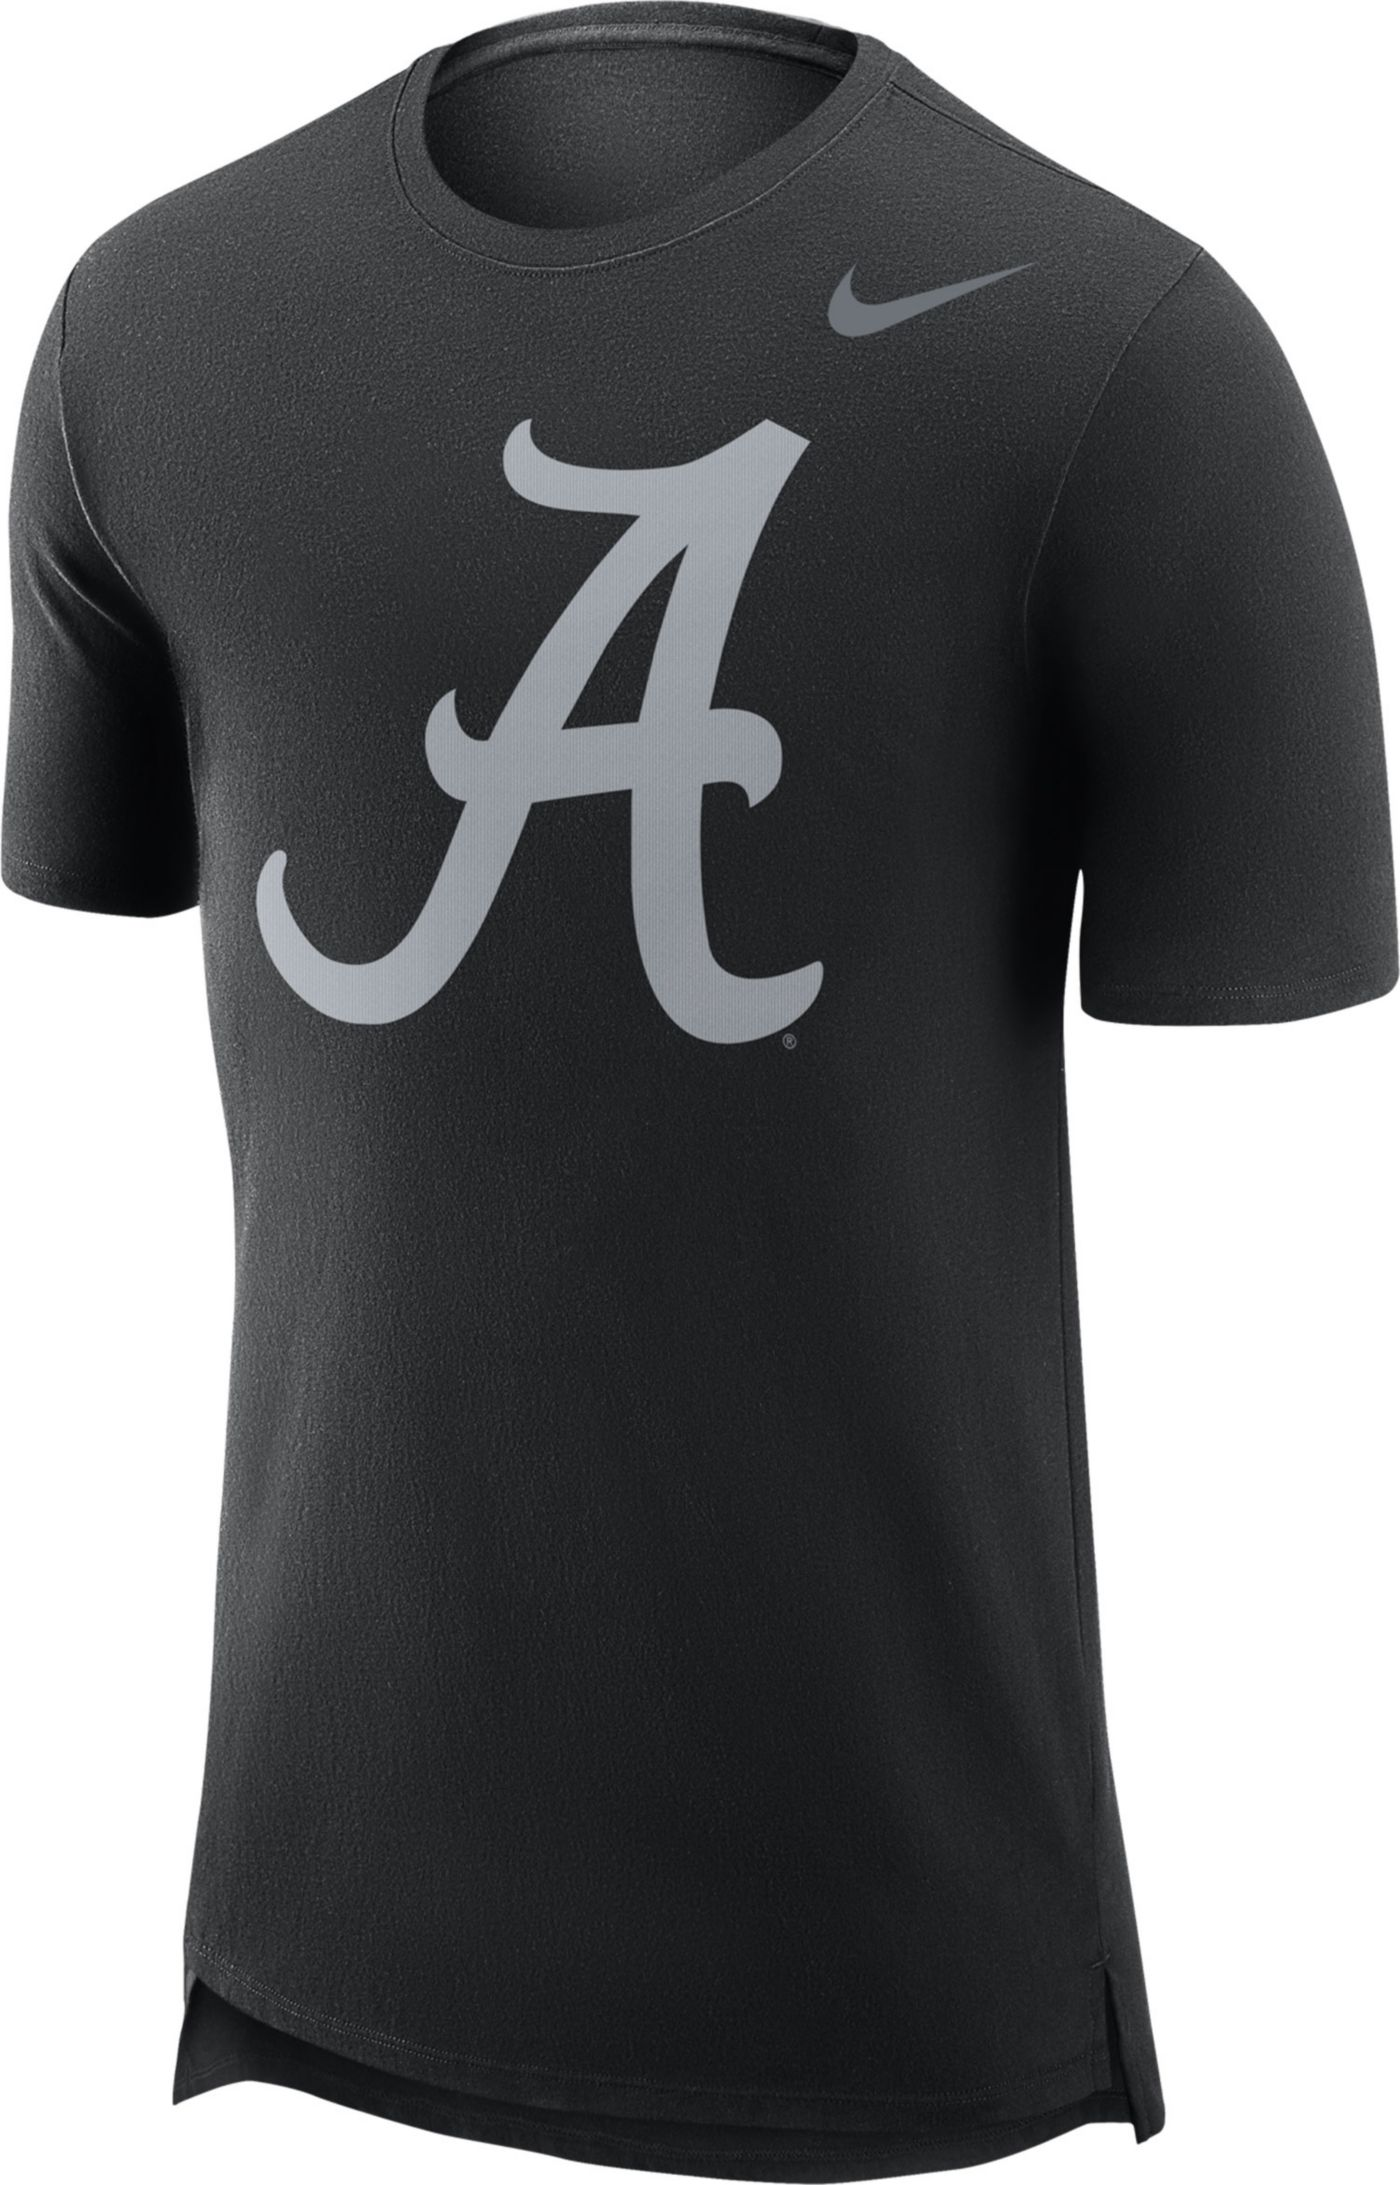 Nike Men's Alabama Crimson Tide Black Enzyme Washed Drop-Tail T-Shirt